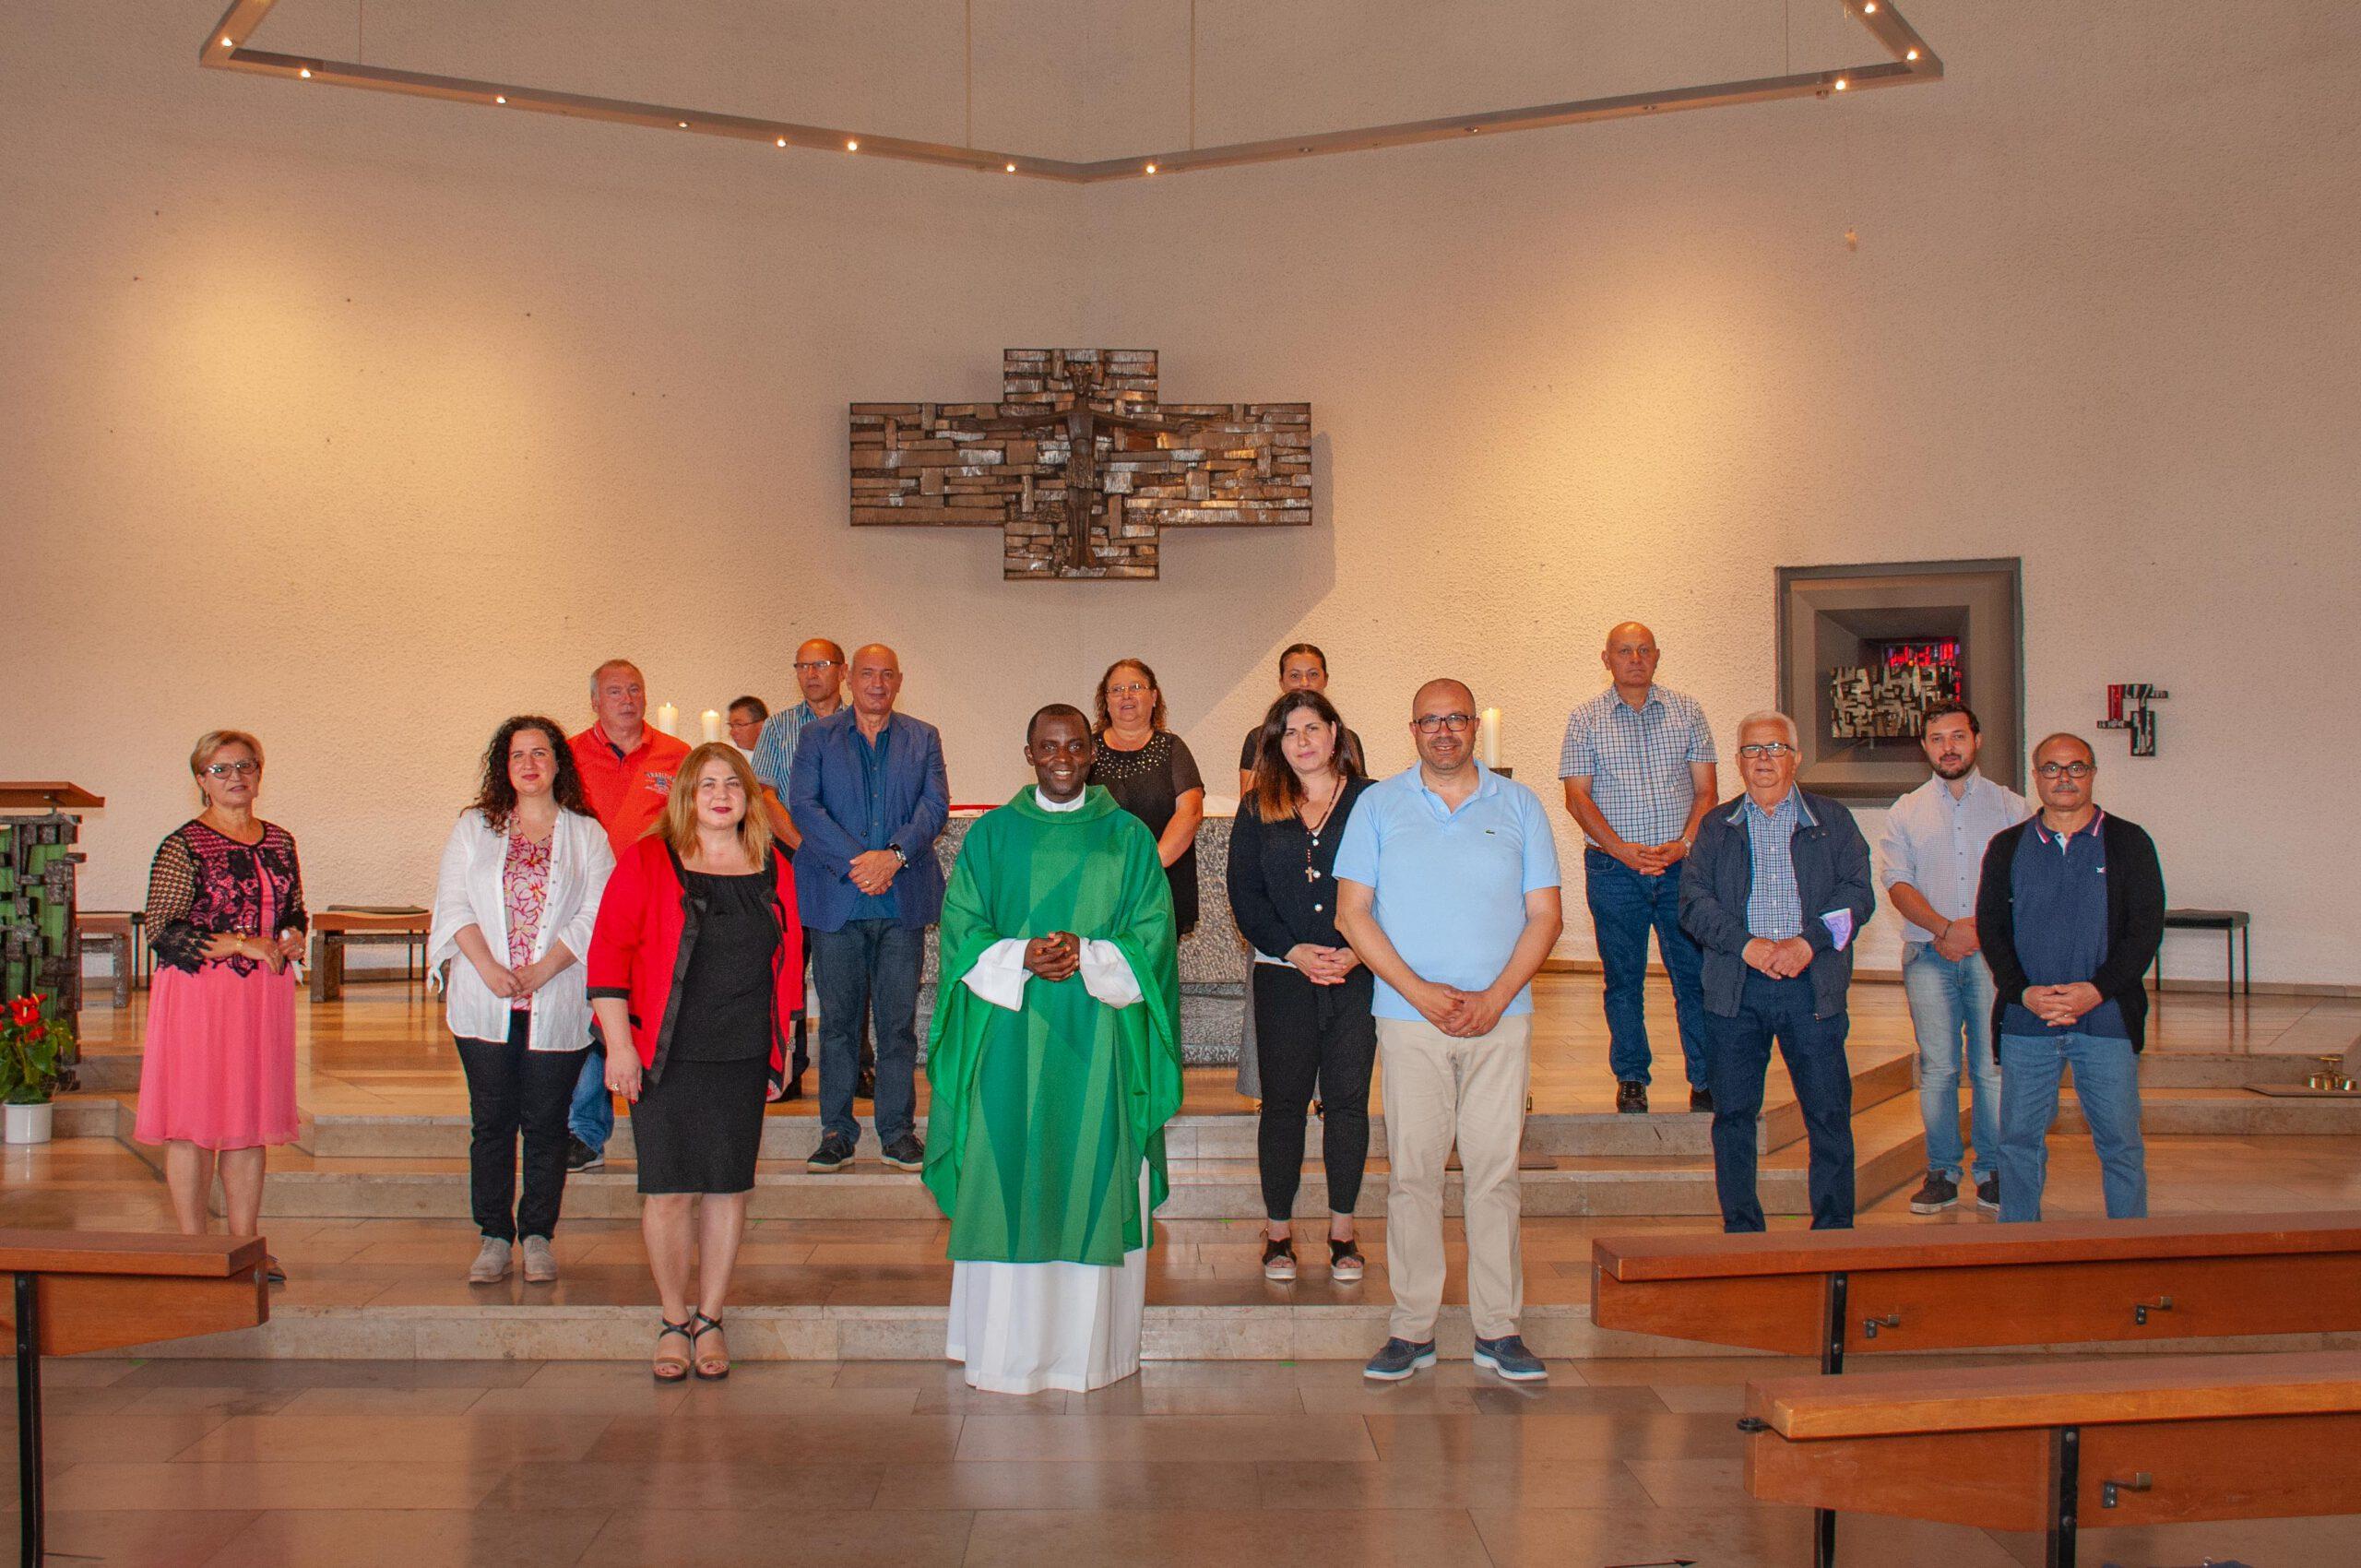 Nuovo consiglio pastorale Esslingen - Wernau